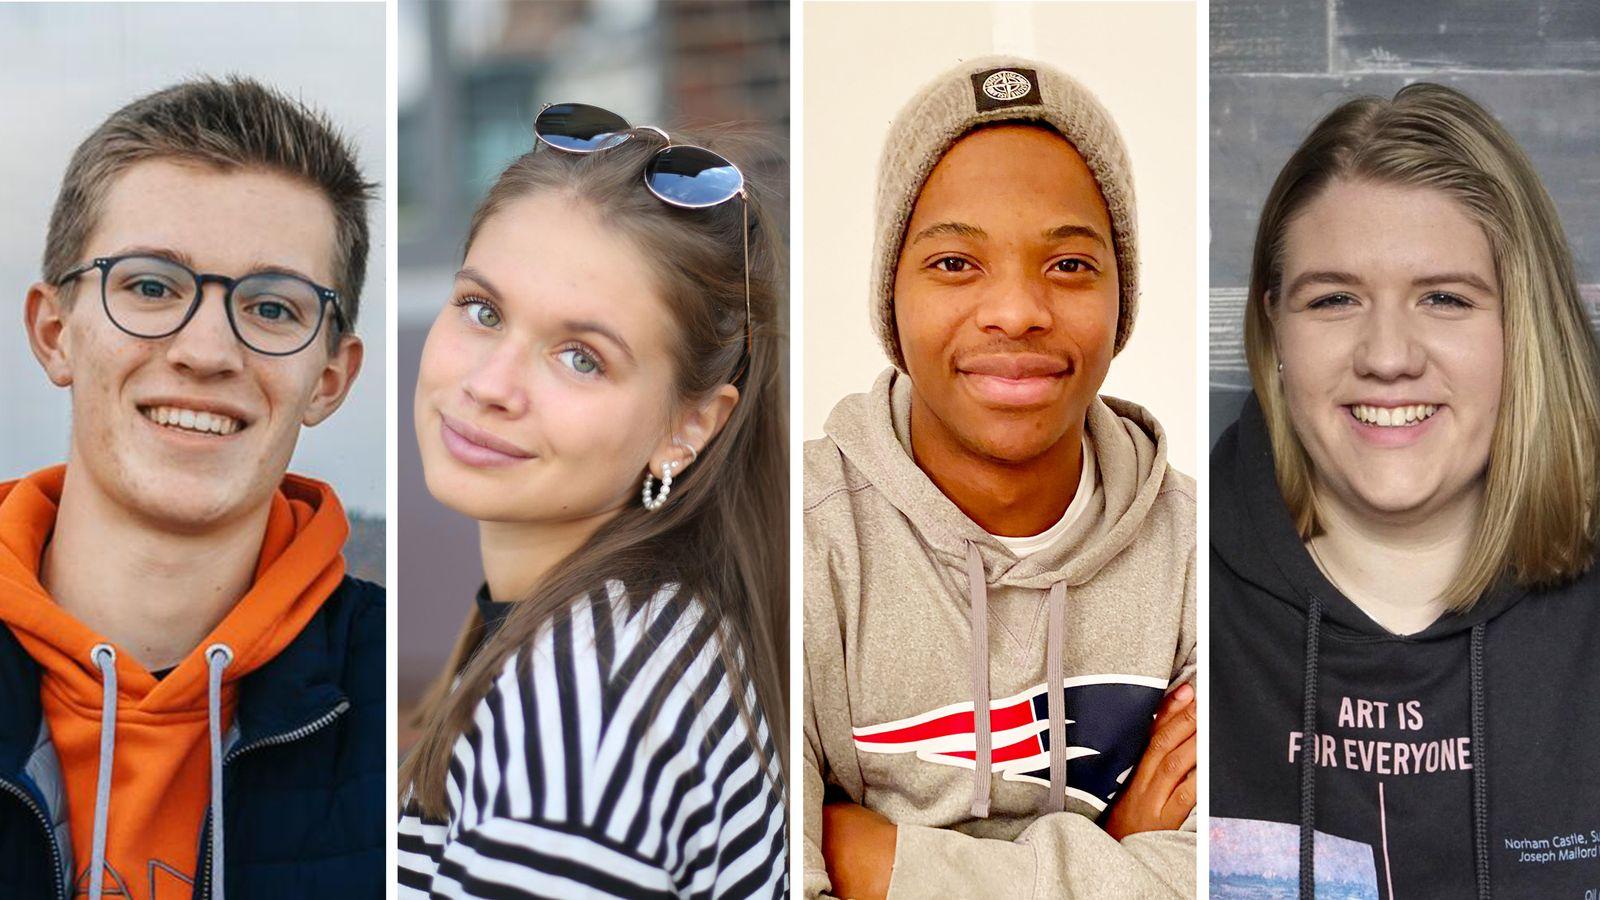 Kombo / Jahr des Lebens / Abiturienten 2020